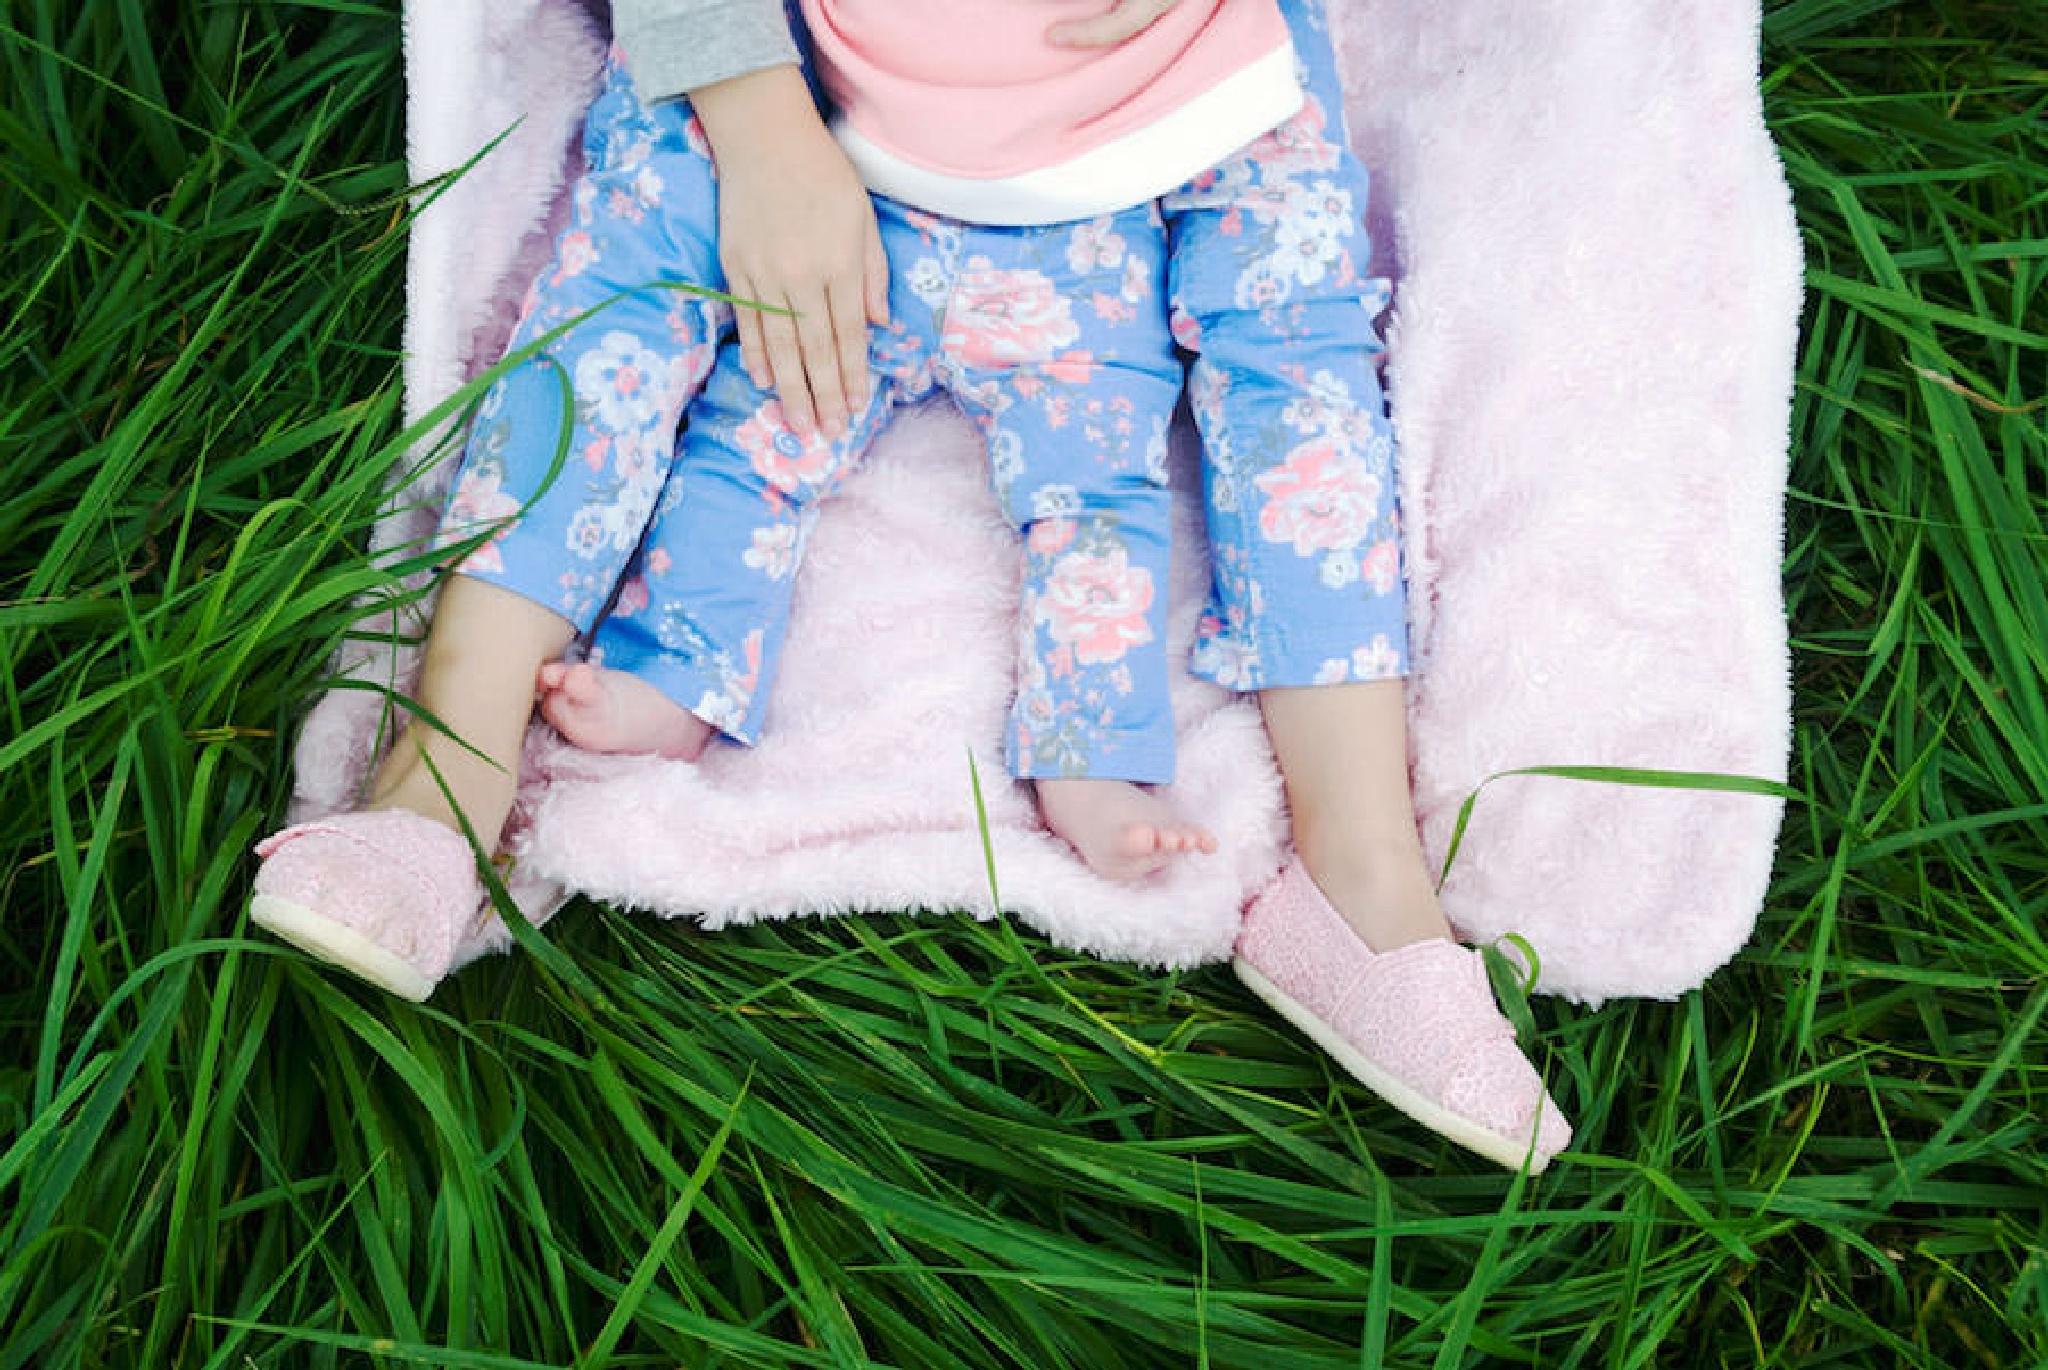 Little Feet by erinsunday